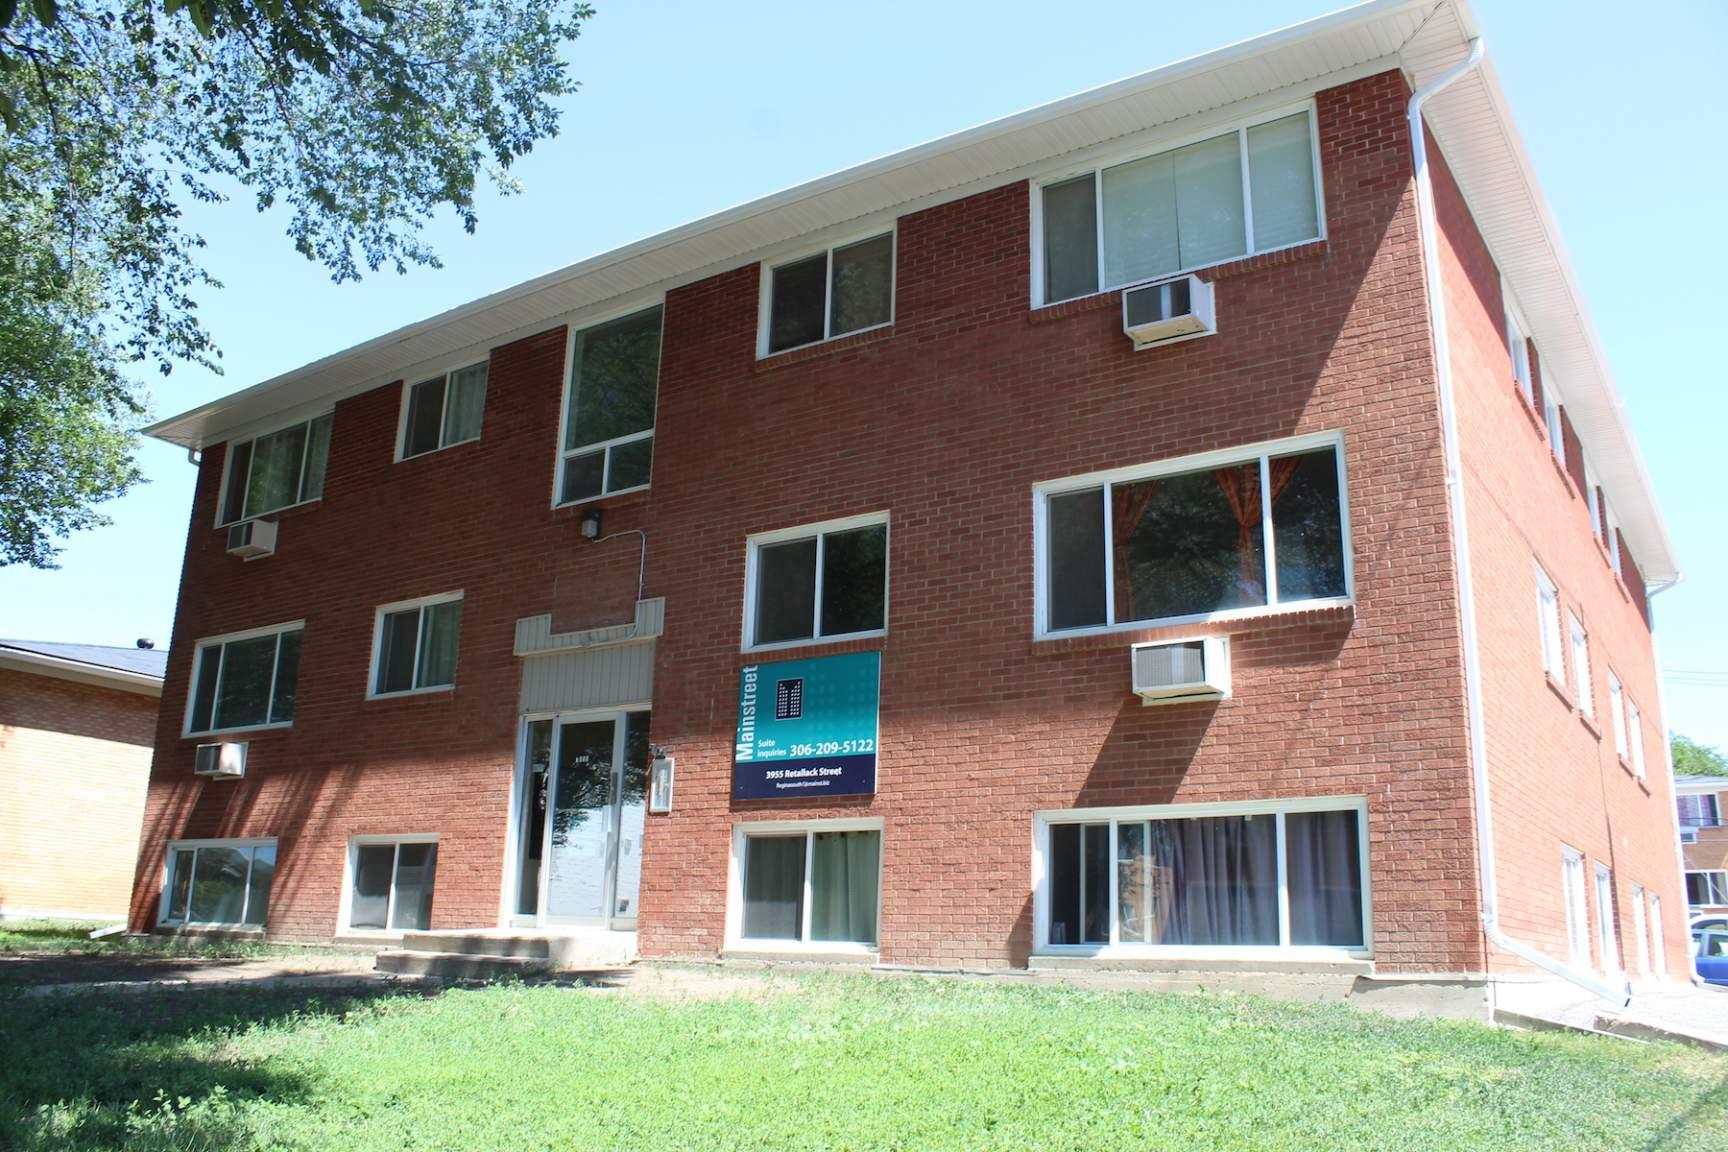 3955 Retallack Street, Regina, SK - 754 CAD/ month